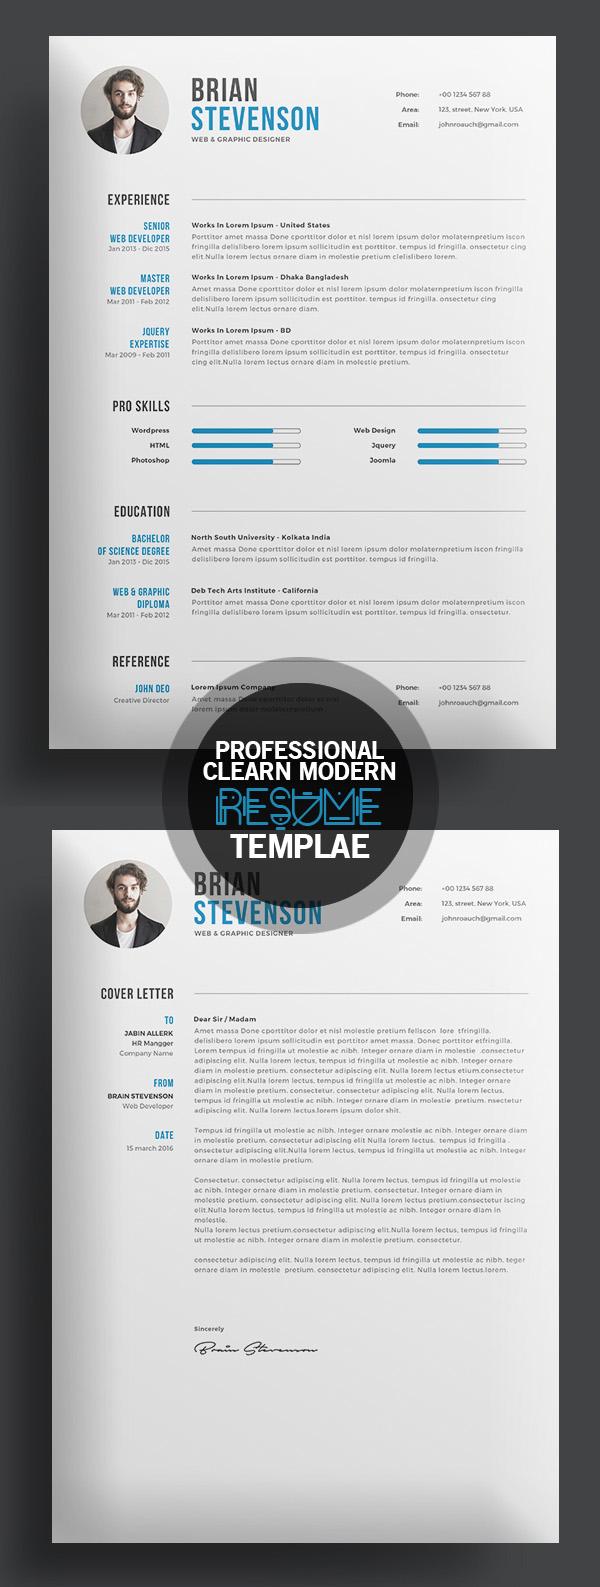 50 Best Minimal Resume Templates - 15